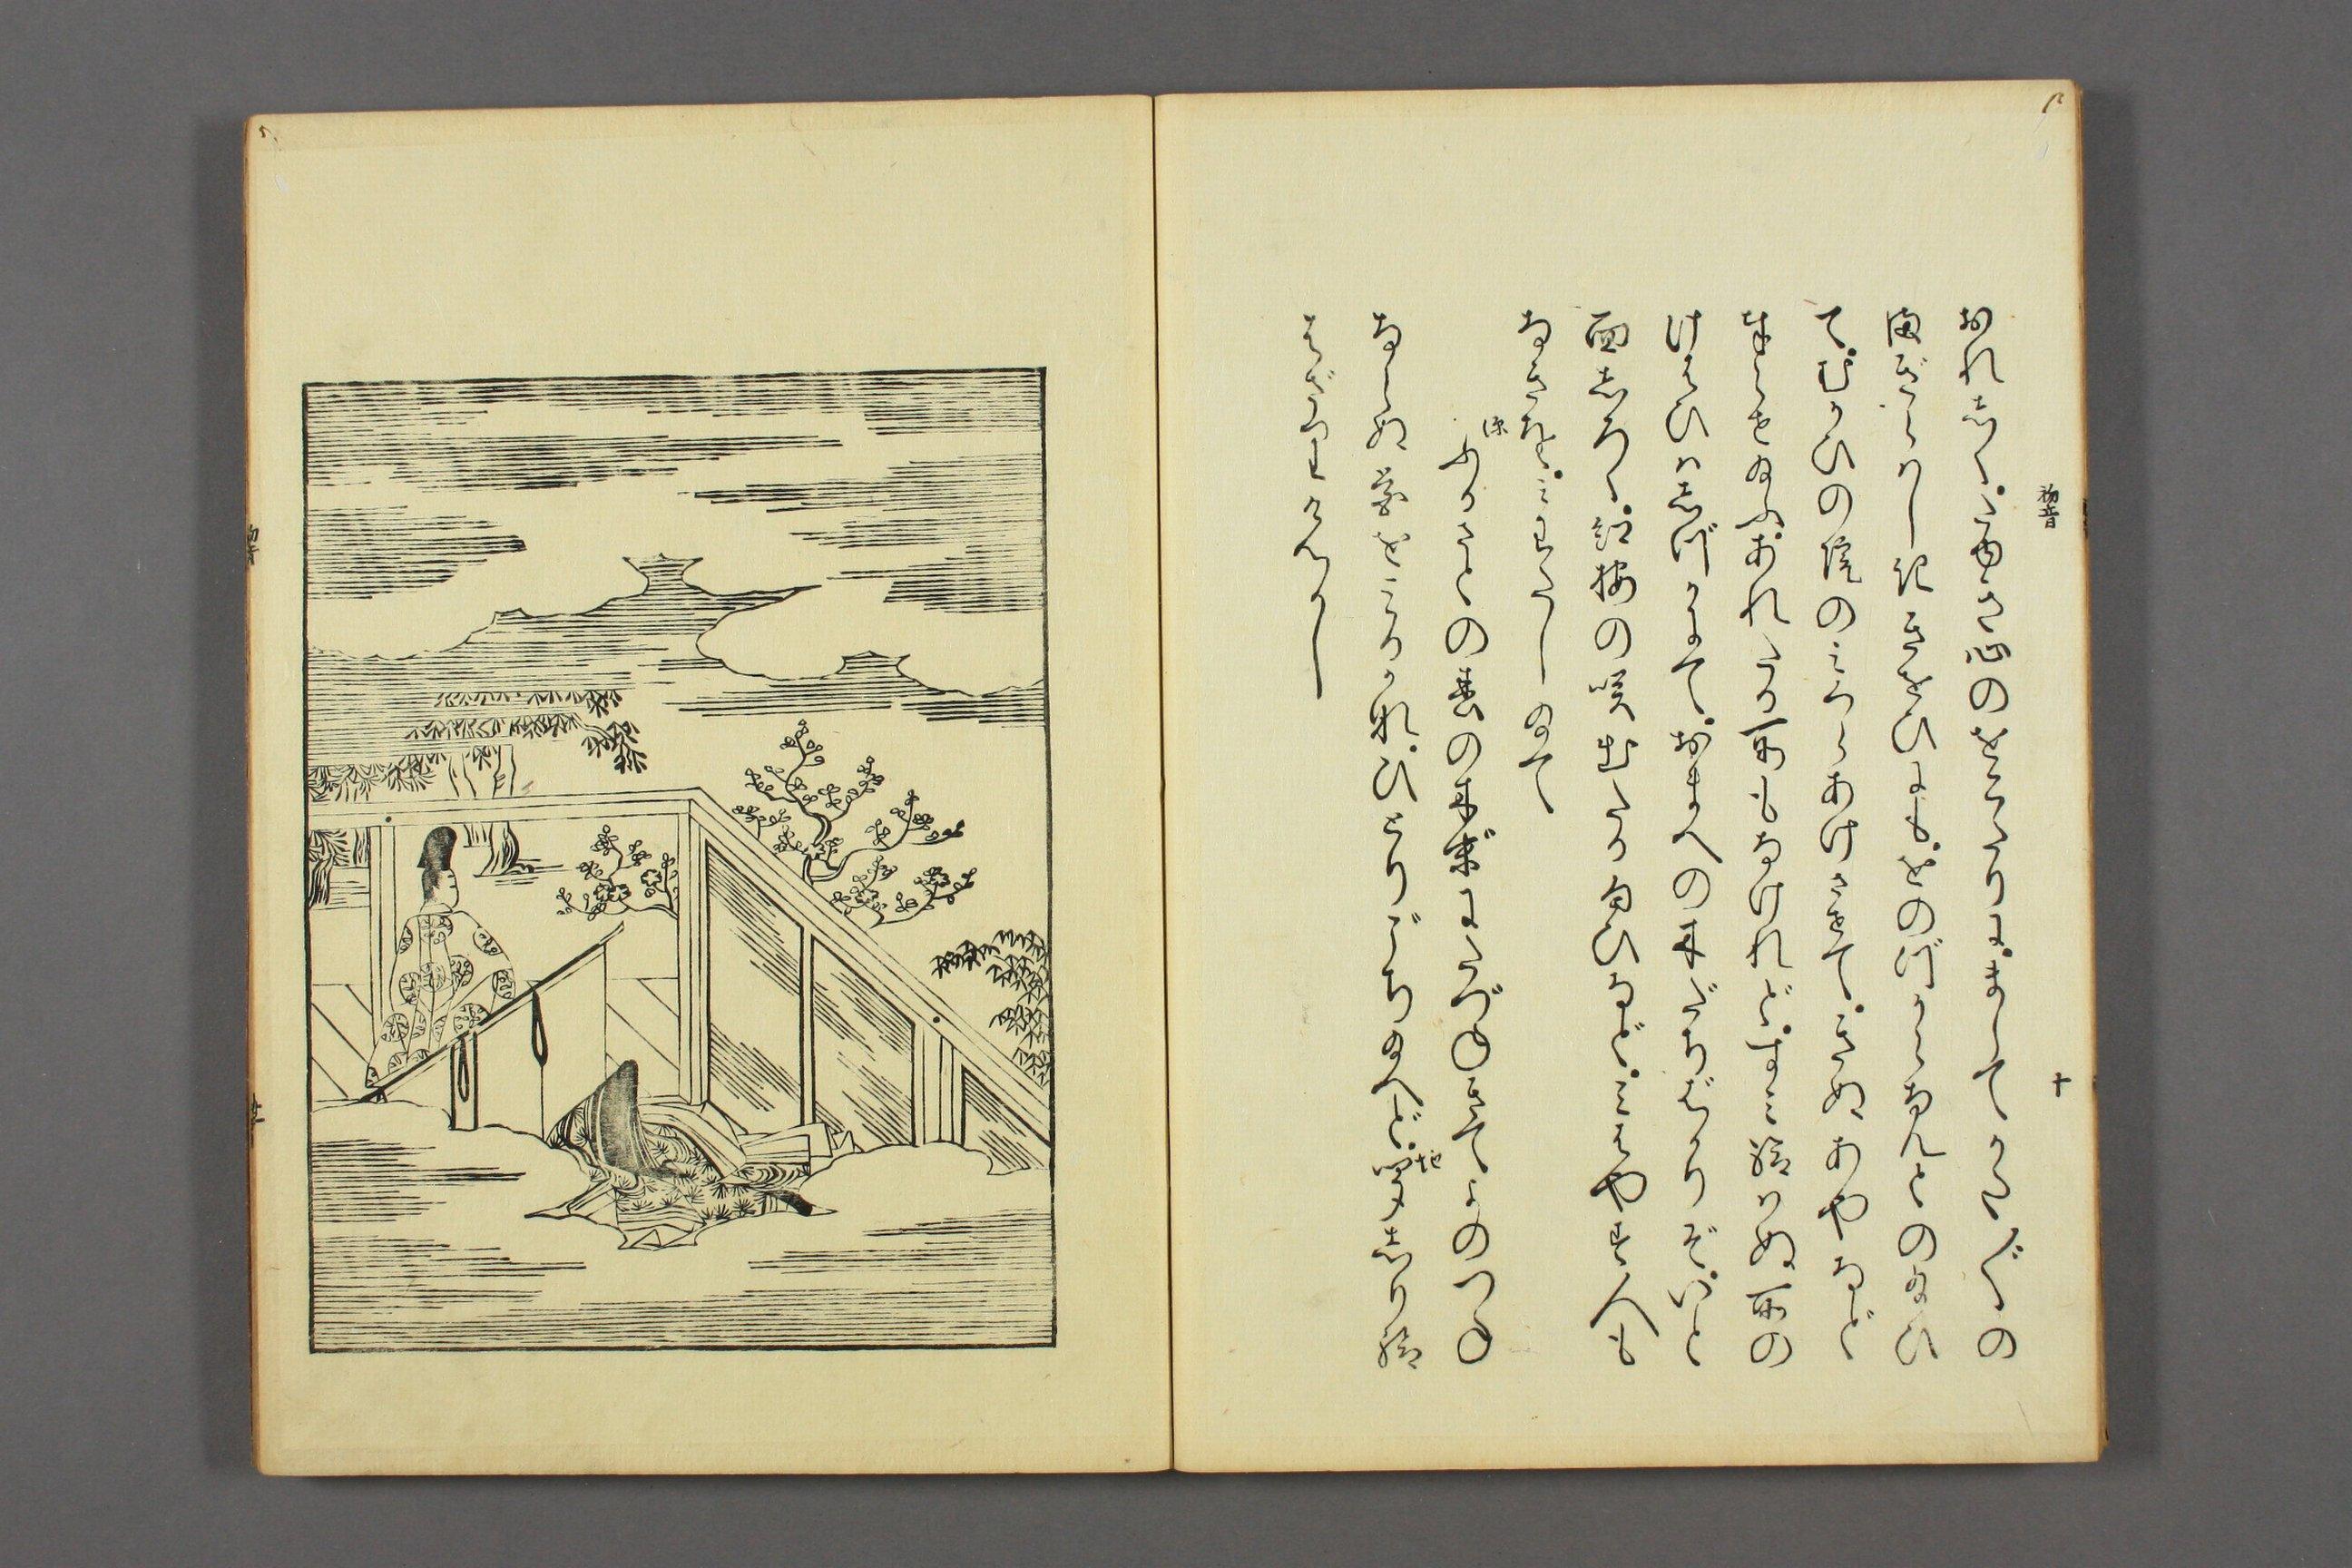 http://archive.wul.waseda.ac.jp/kosho/bunko30/bunko30_a0007/bunko30_a0007_0023/bunko30_a0007_0023_p0012.jpg